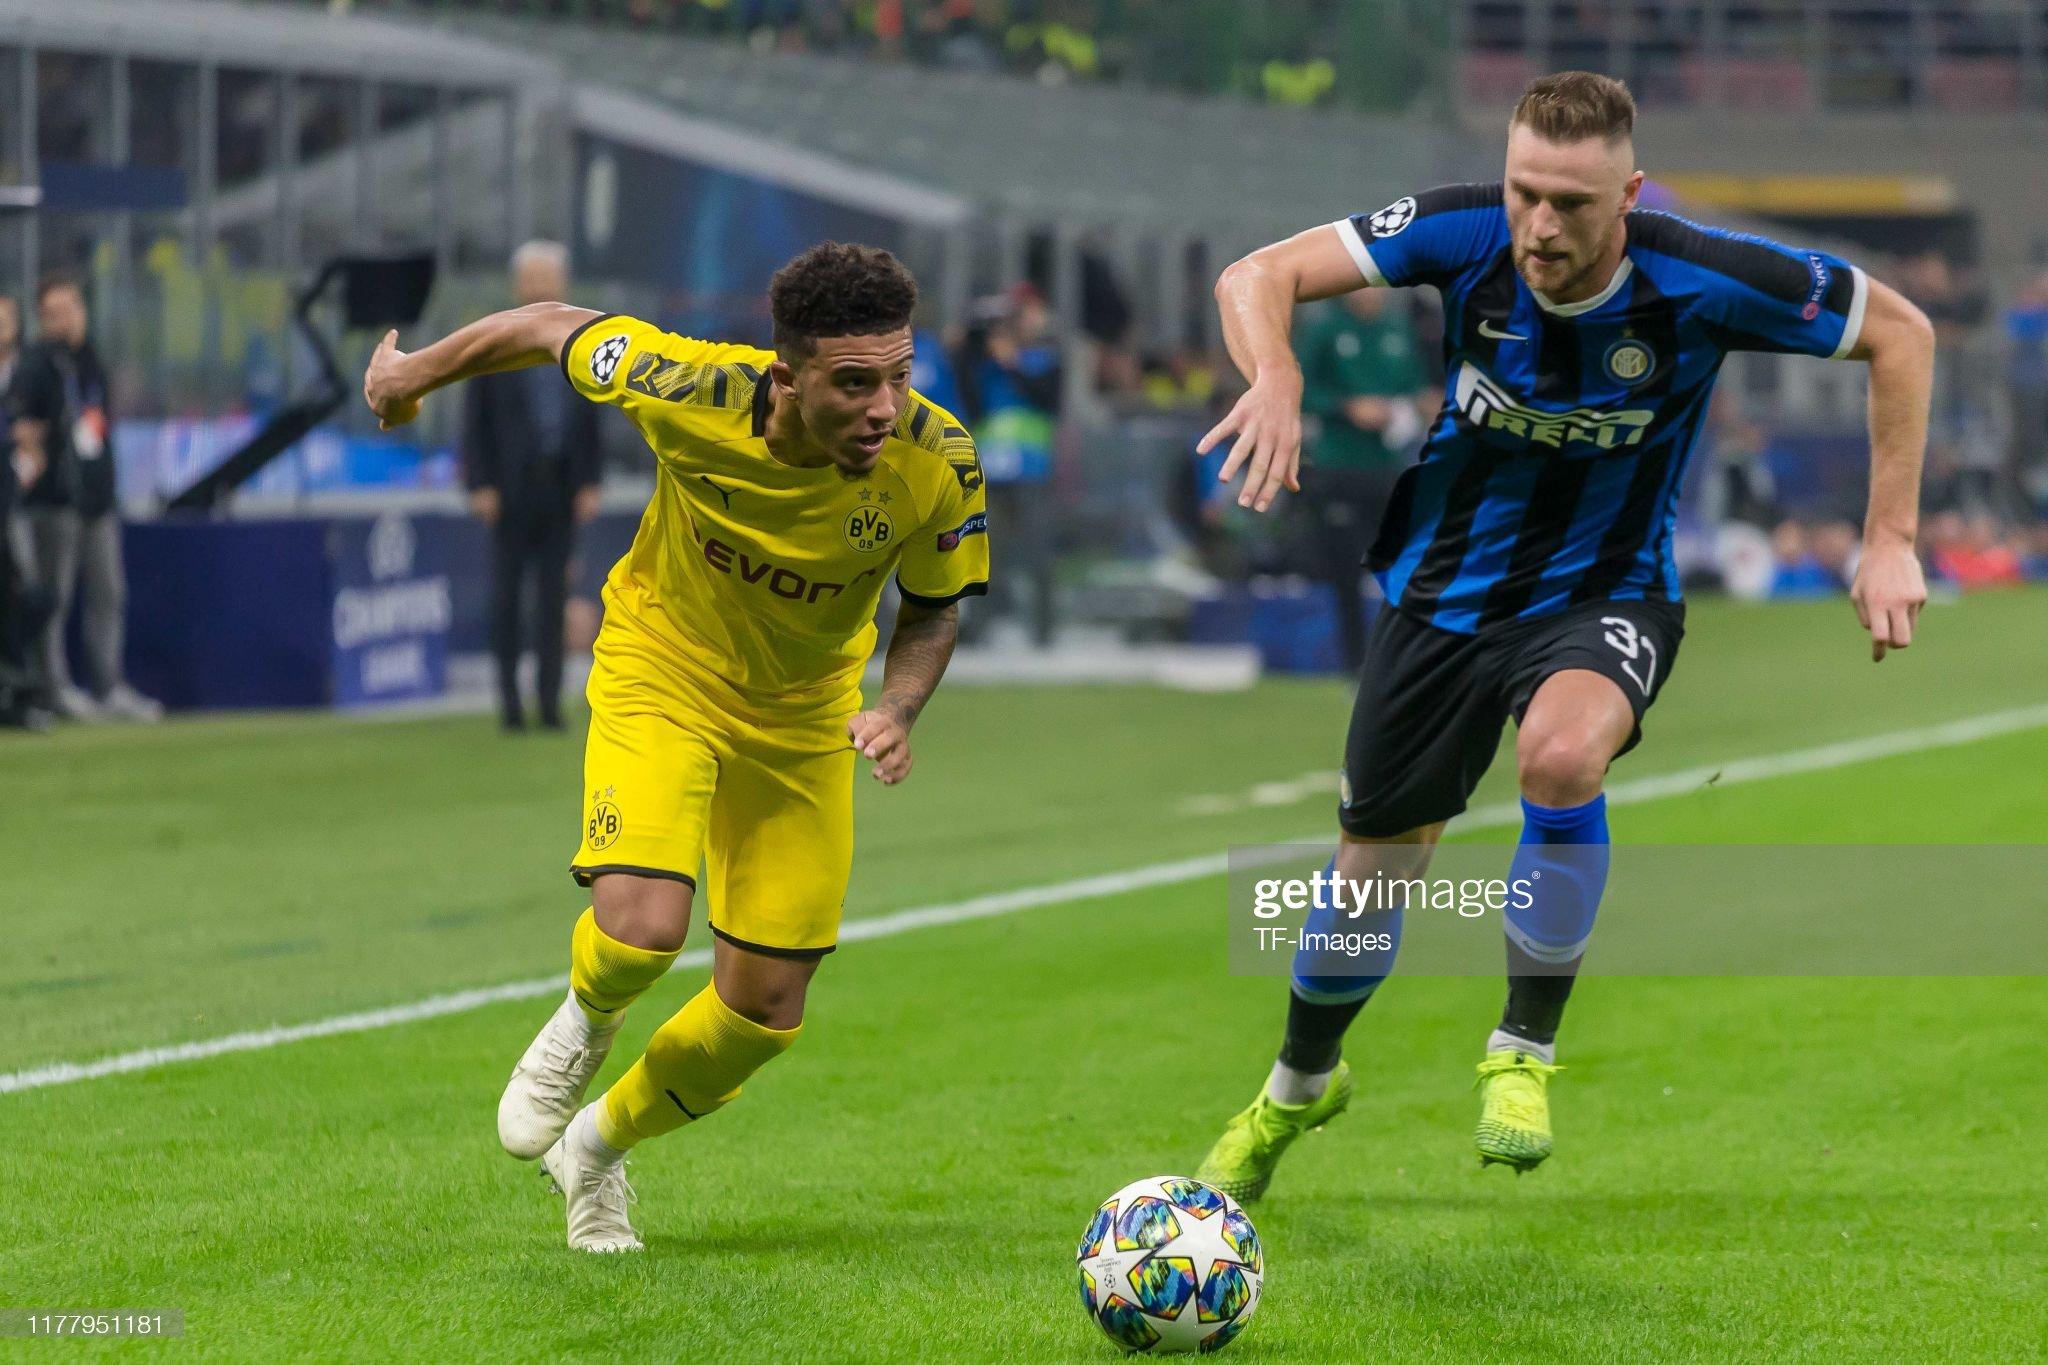 Dortmund v Inter preview, prediction and odds